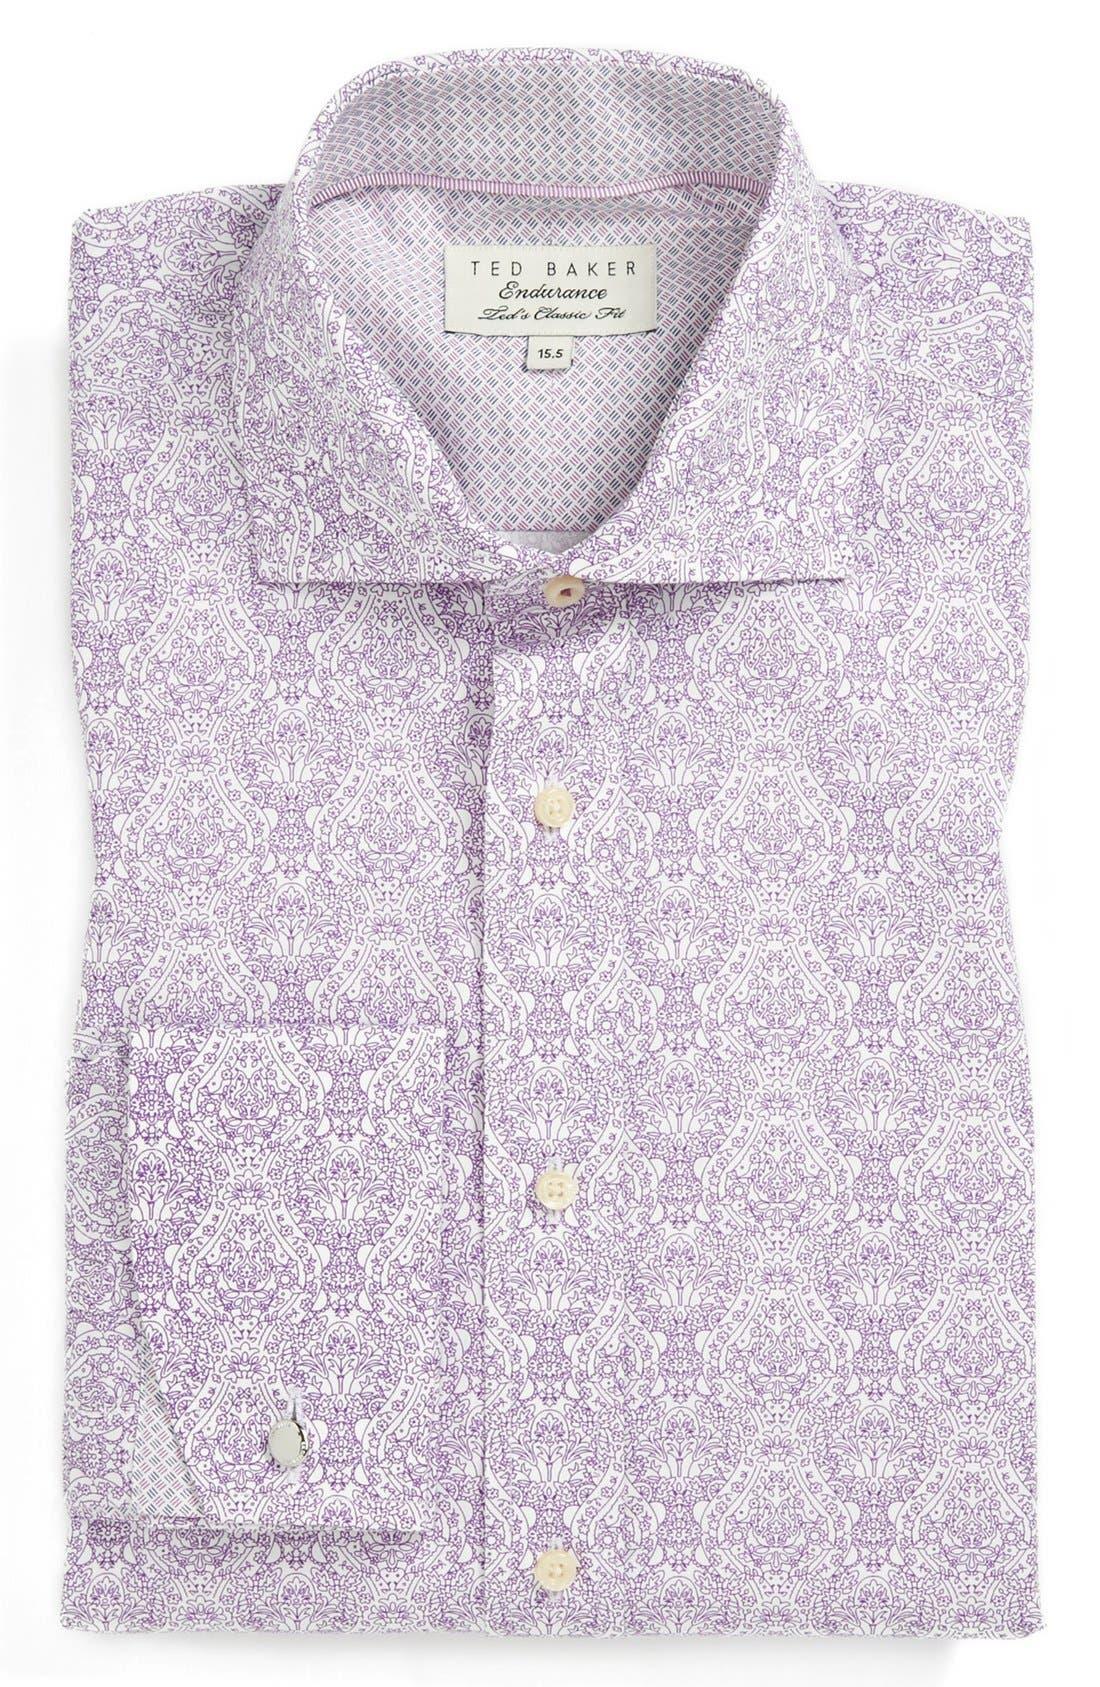 Alternate Image 1 Selected - Ted Baker London Extra Trim Fit Dress Shirt